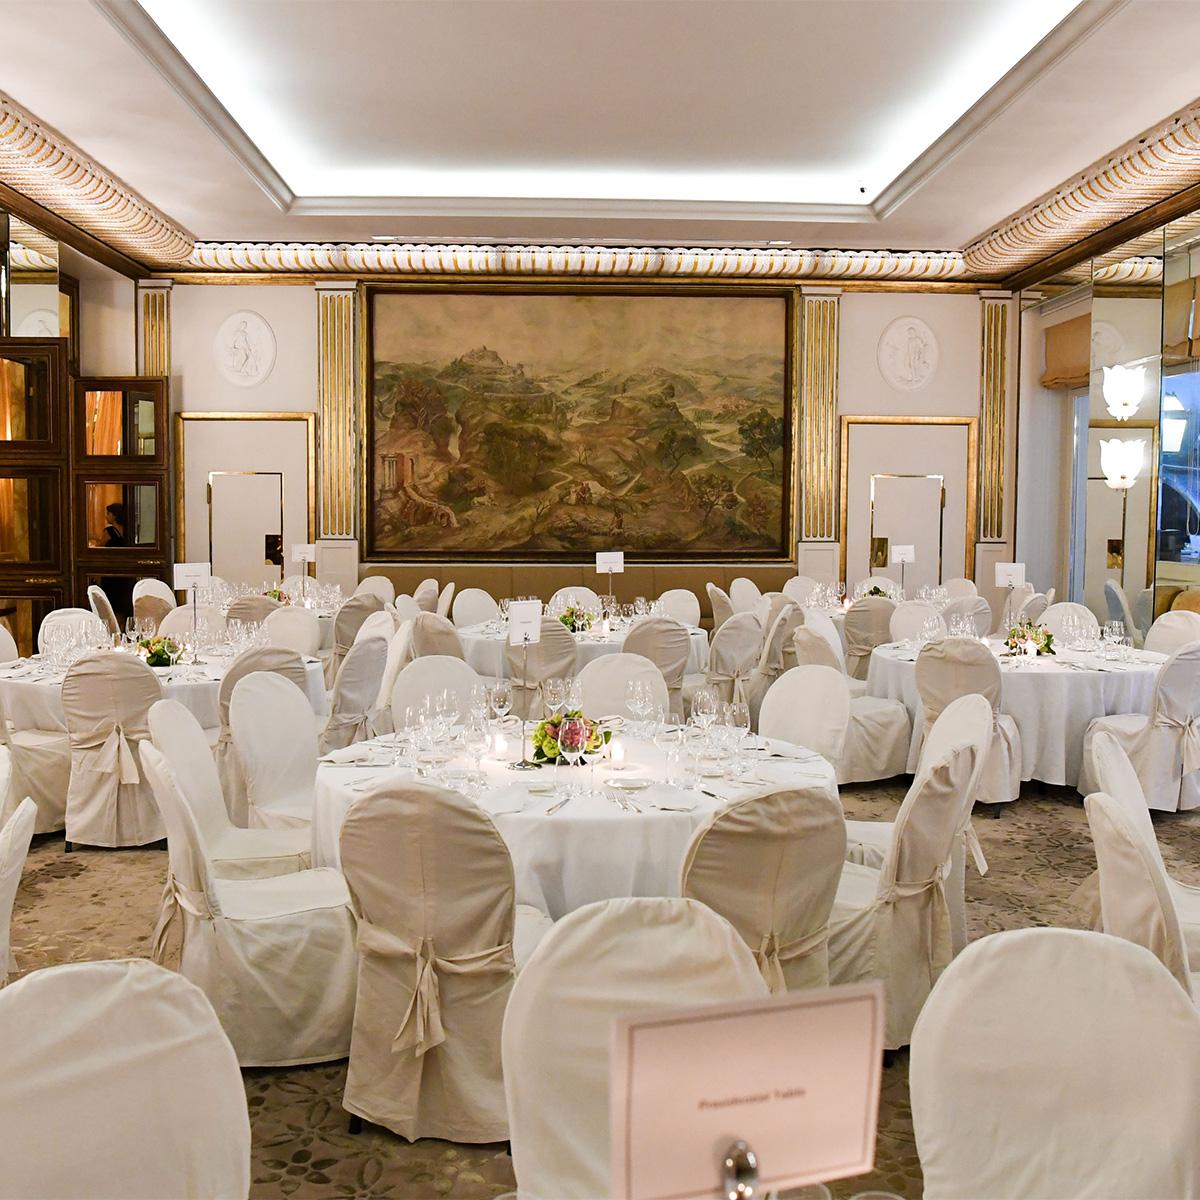 Salone Medici gala dinner